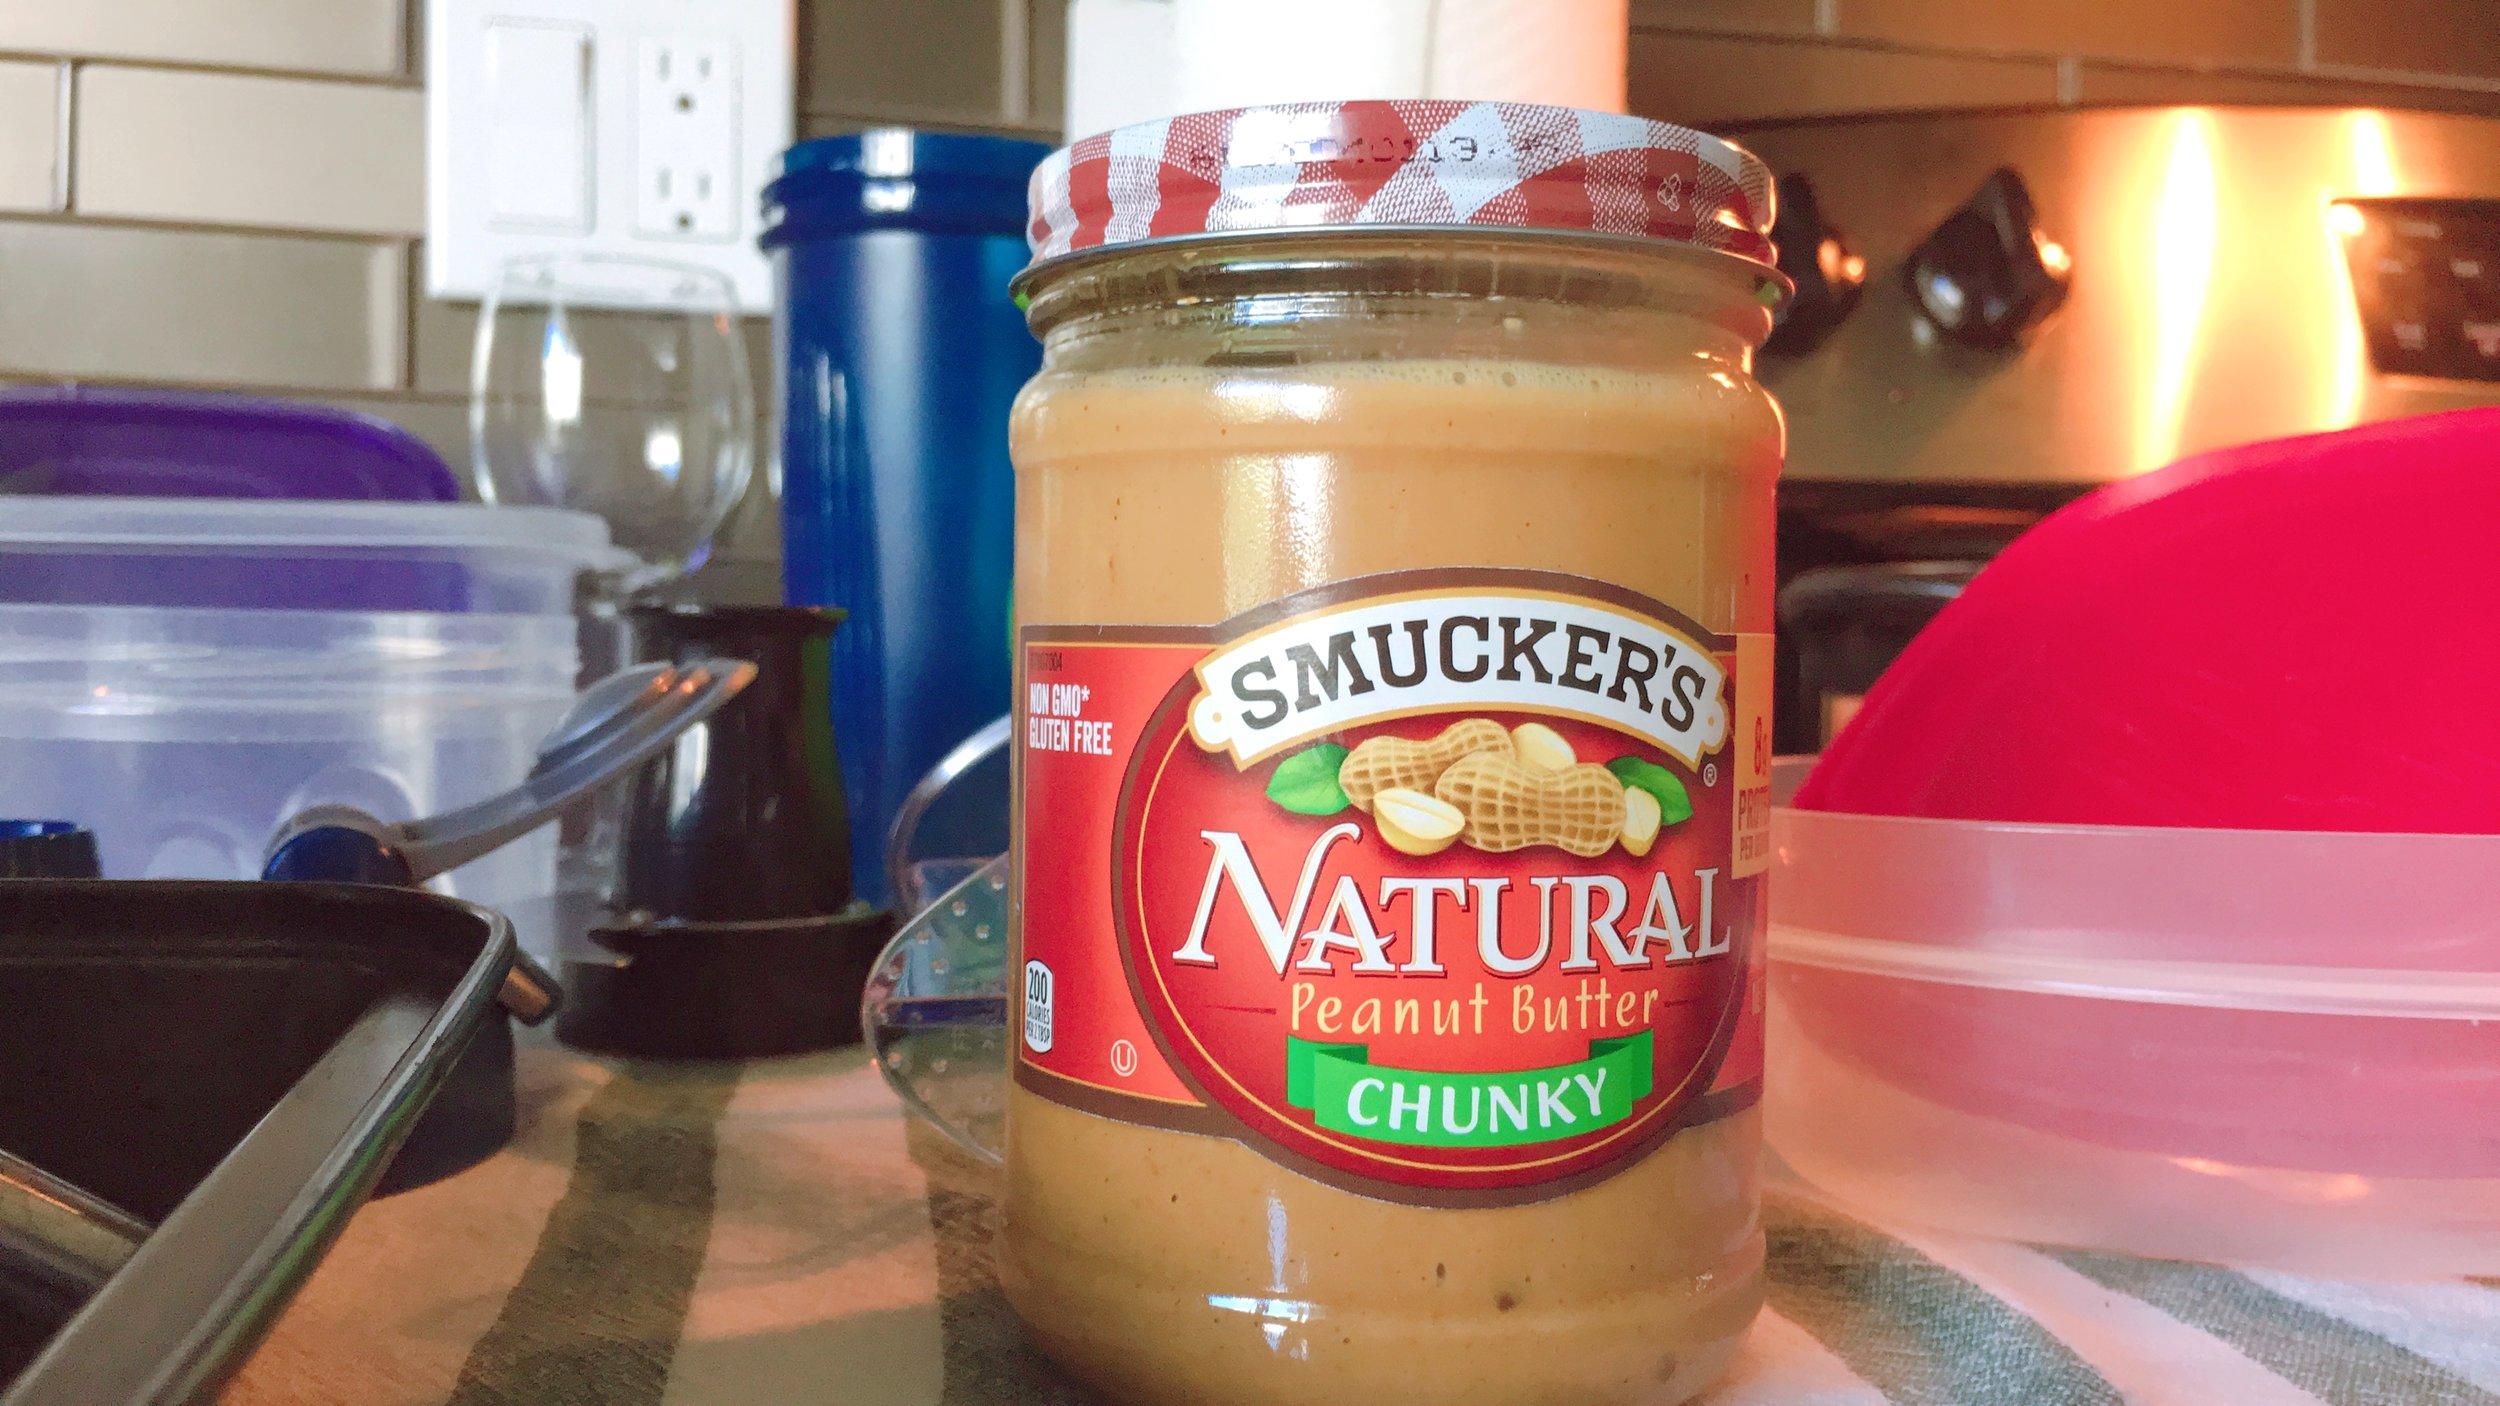 My favourite peanut butter - no sugar and salt added. Just peanut butter. Best friend to oats.